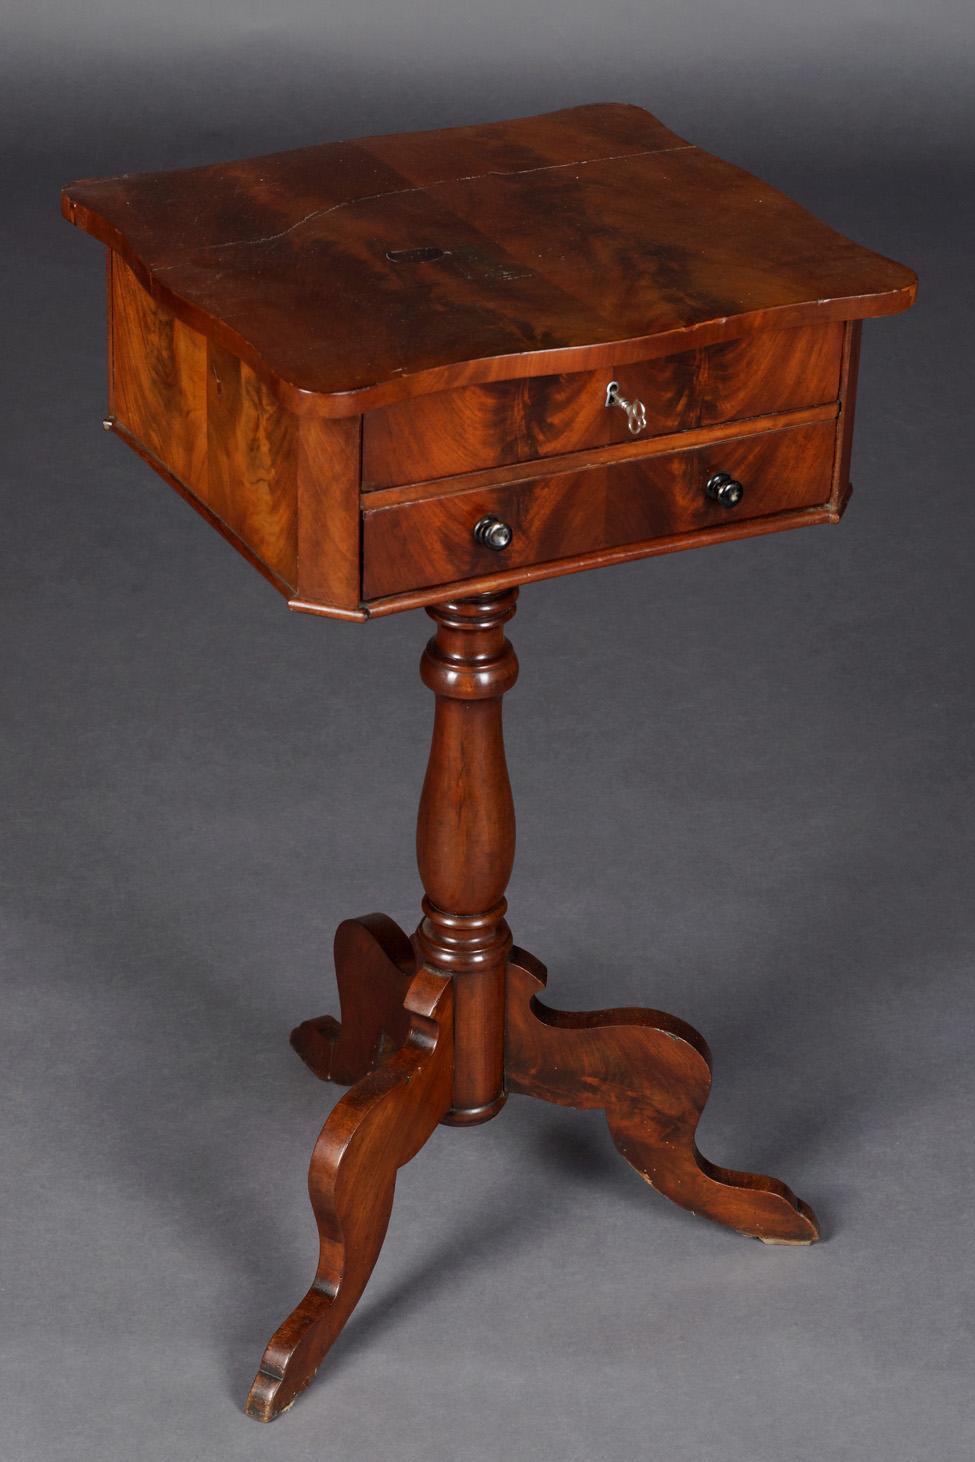 Antique sewing table louis philippe um 1860 ebay for Table louis philippe